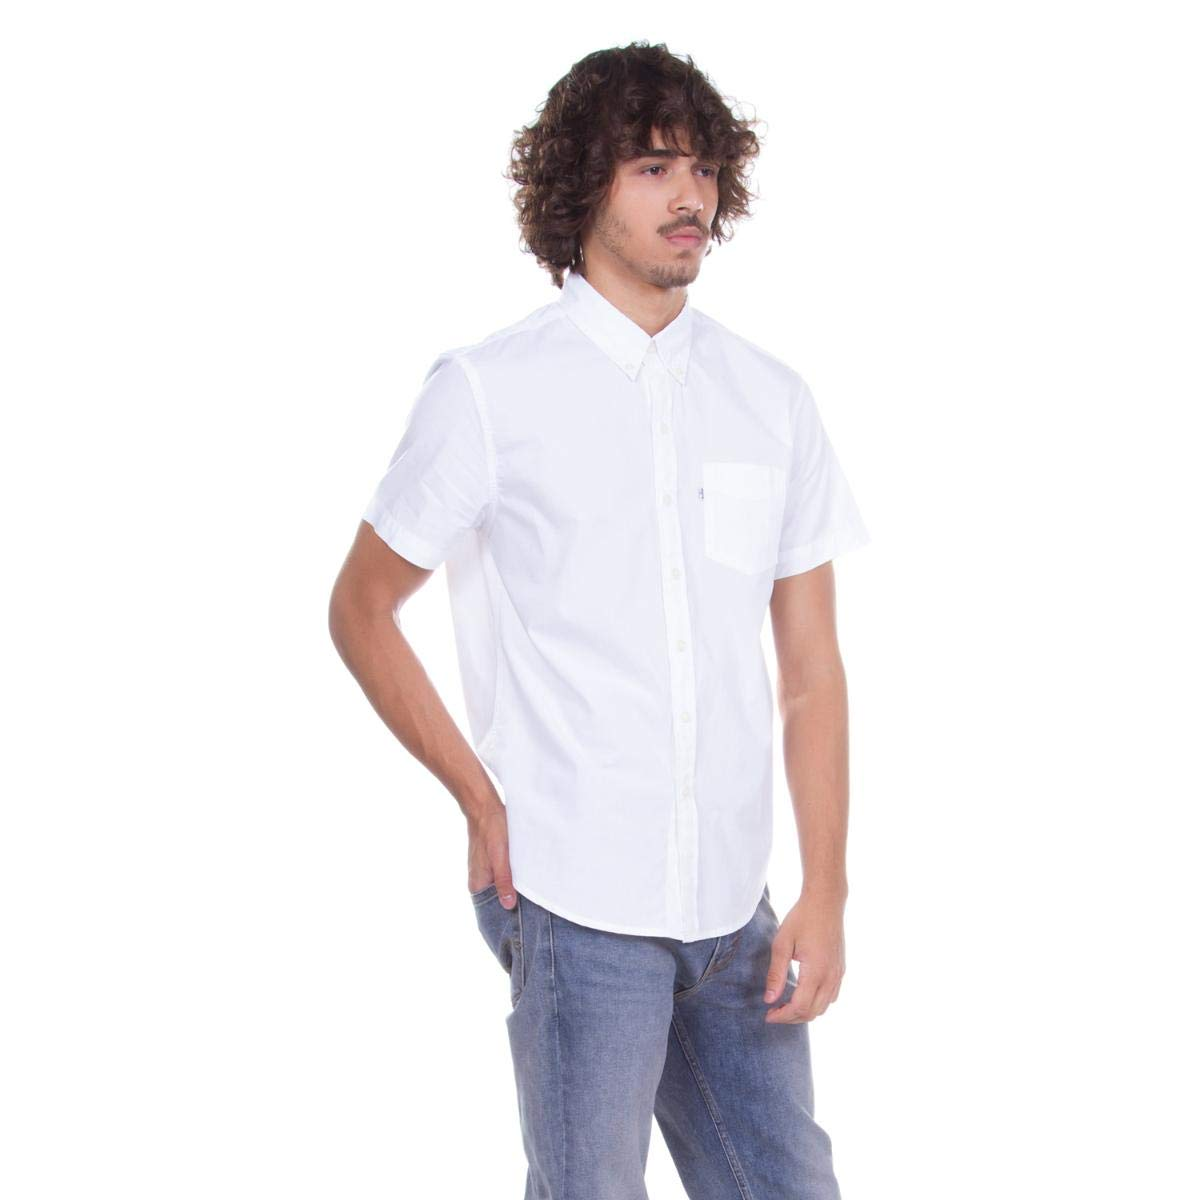 2a3a8864f26e2 Camisa Levis Masculino Sunset Classic One Pocket Branco  Amazon.com.br   Amazon Moda